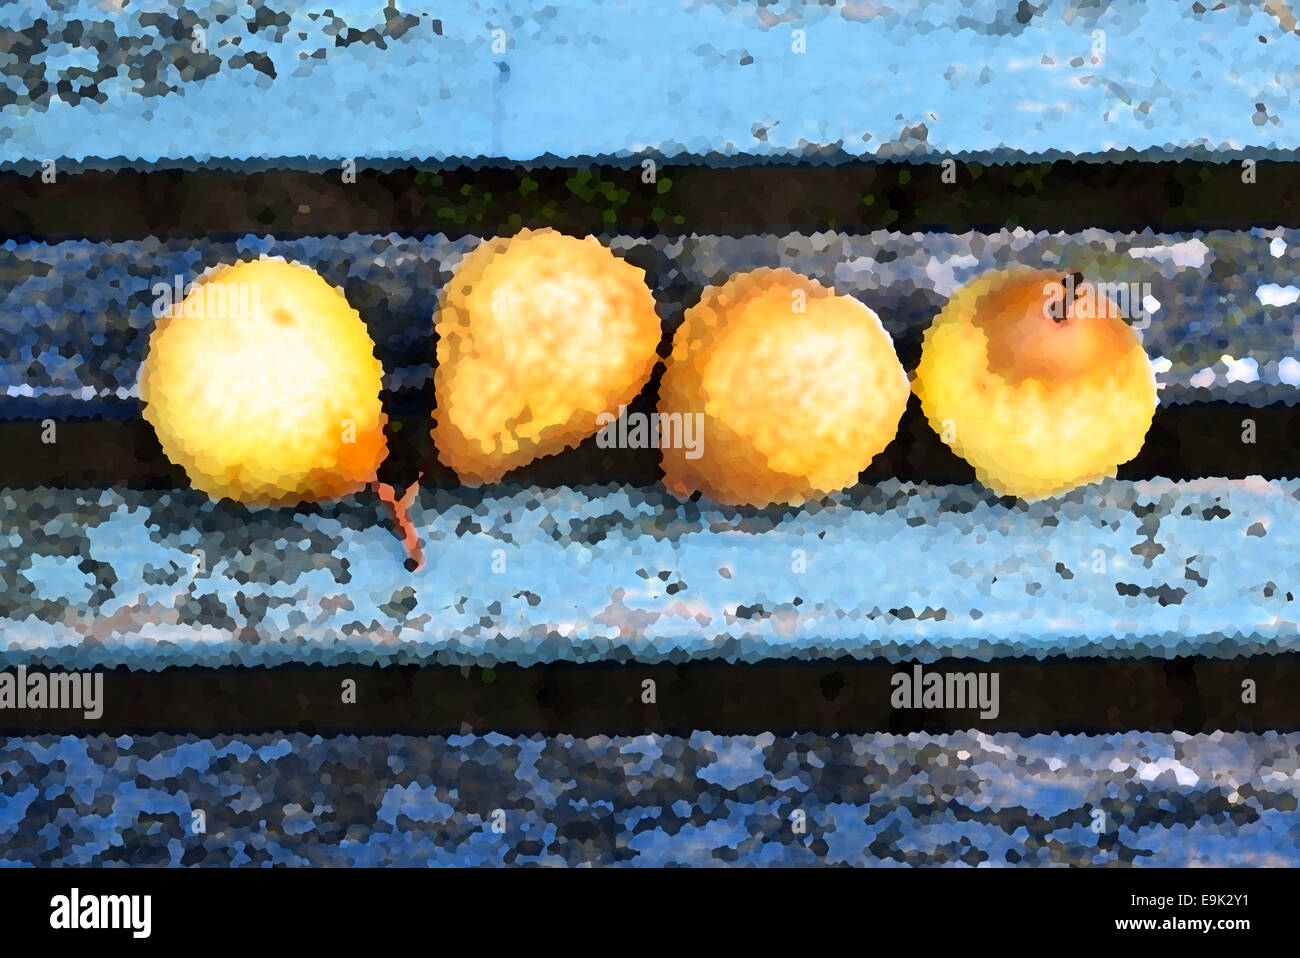 Four ripe pears illustration Stock Photo